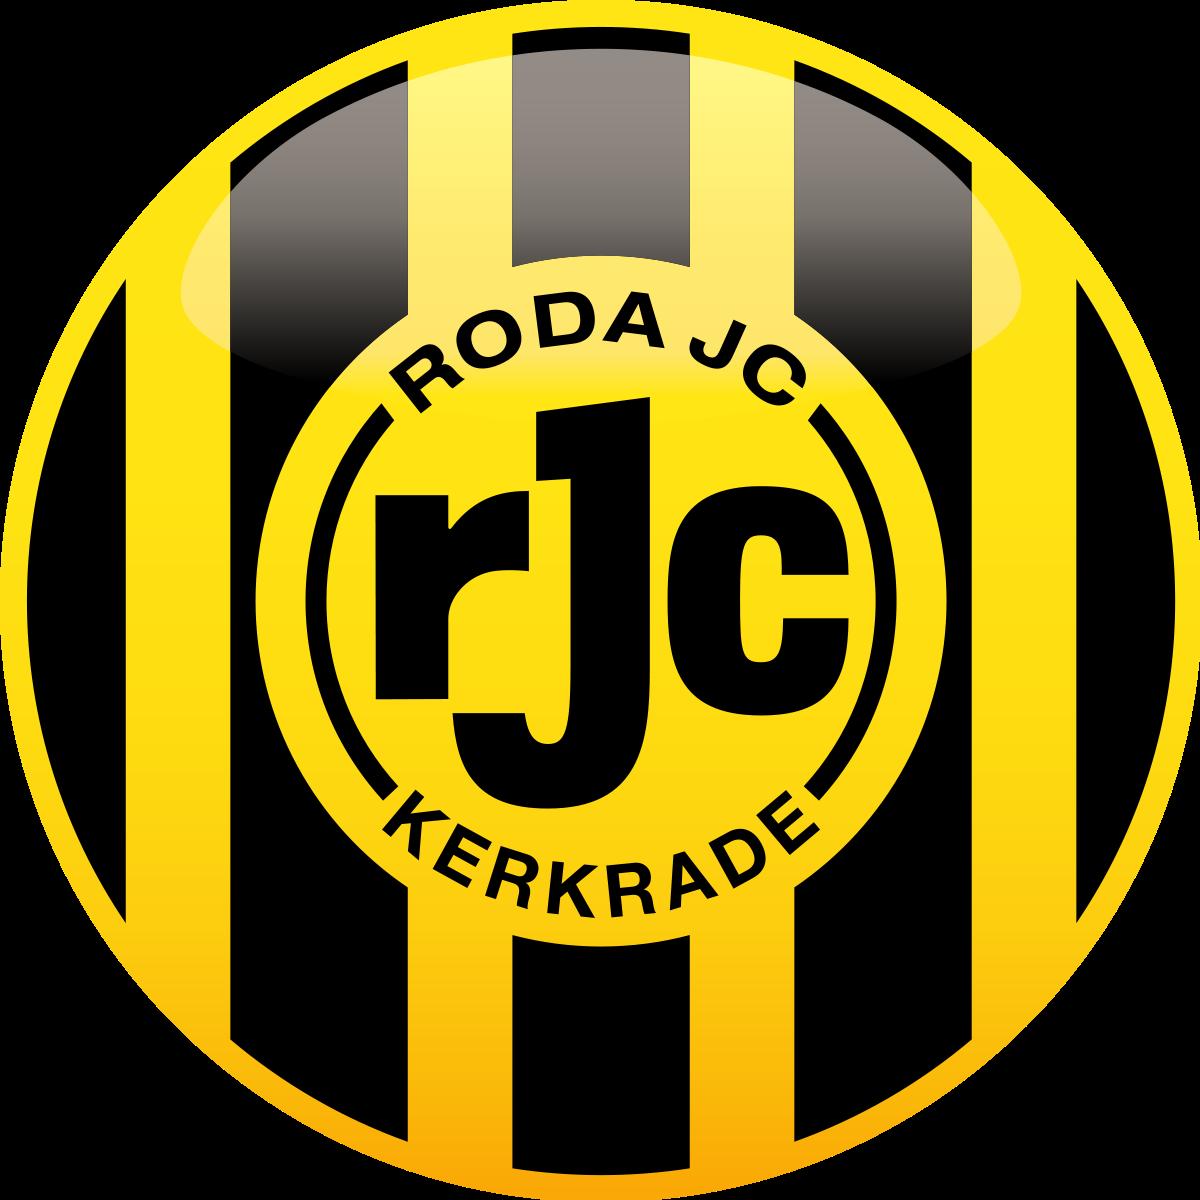 Roda-2 logo